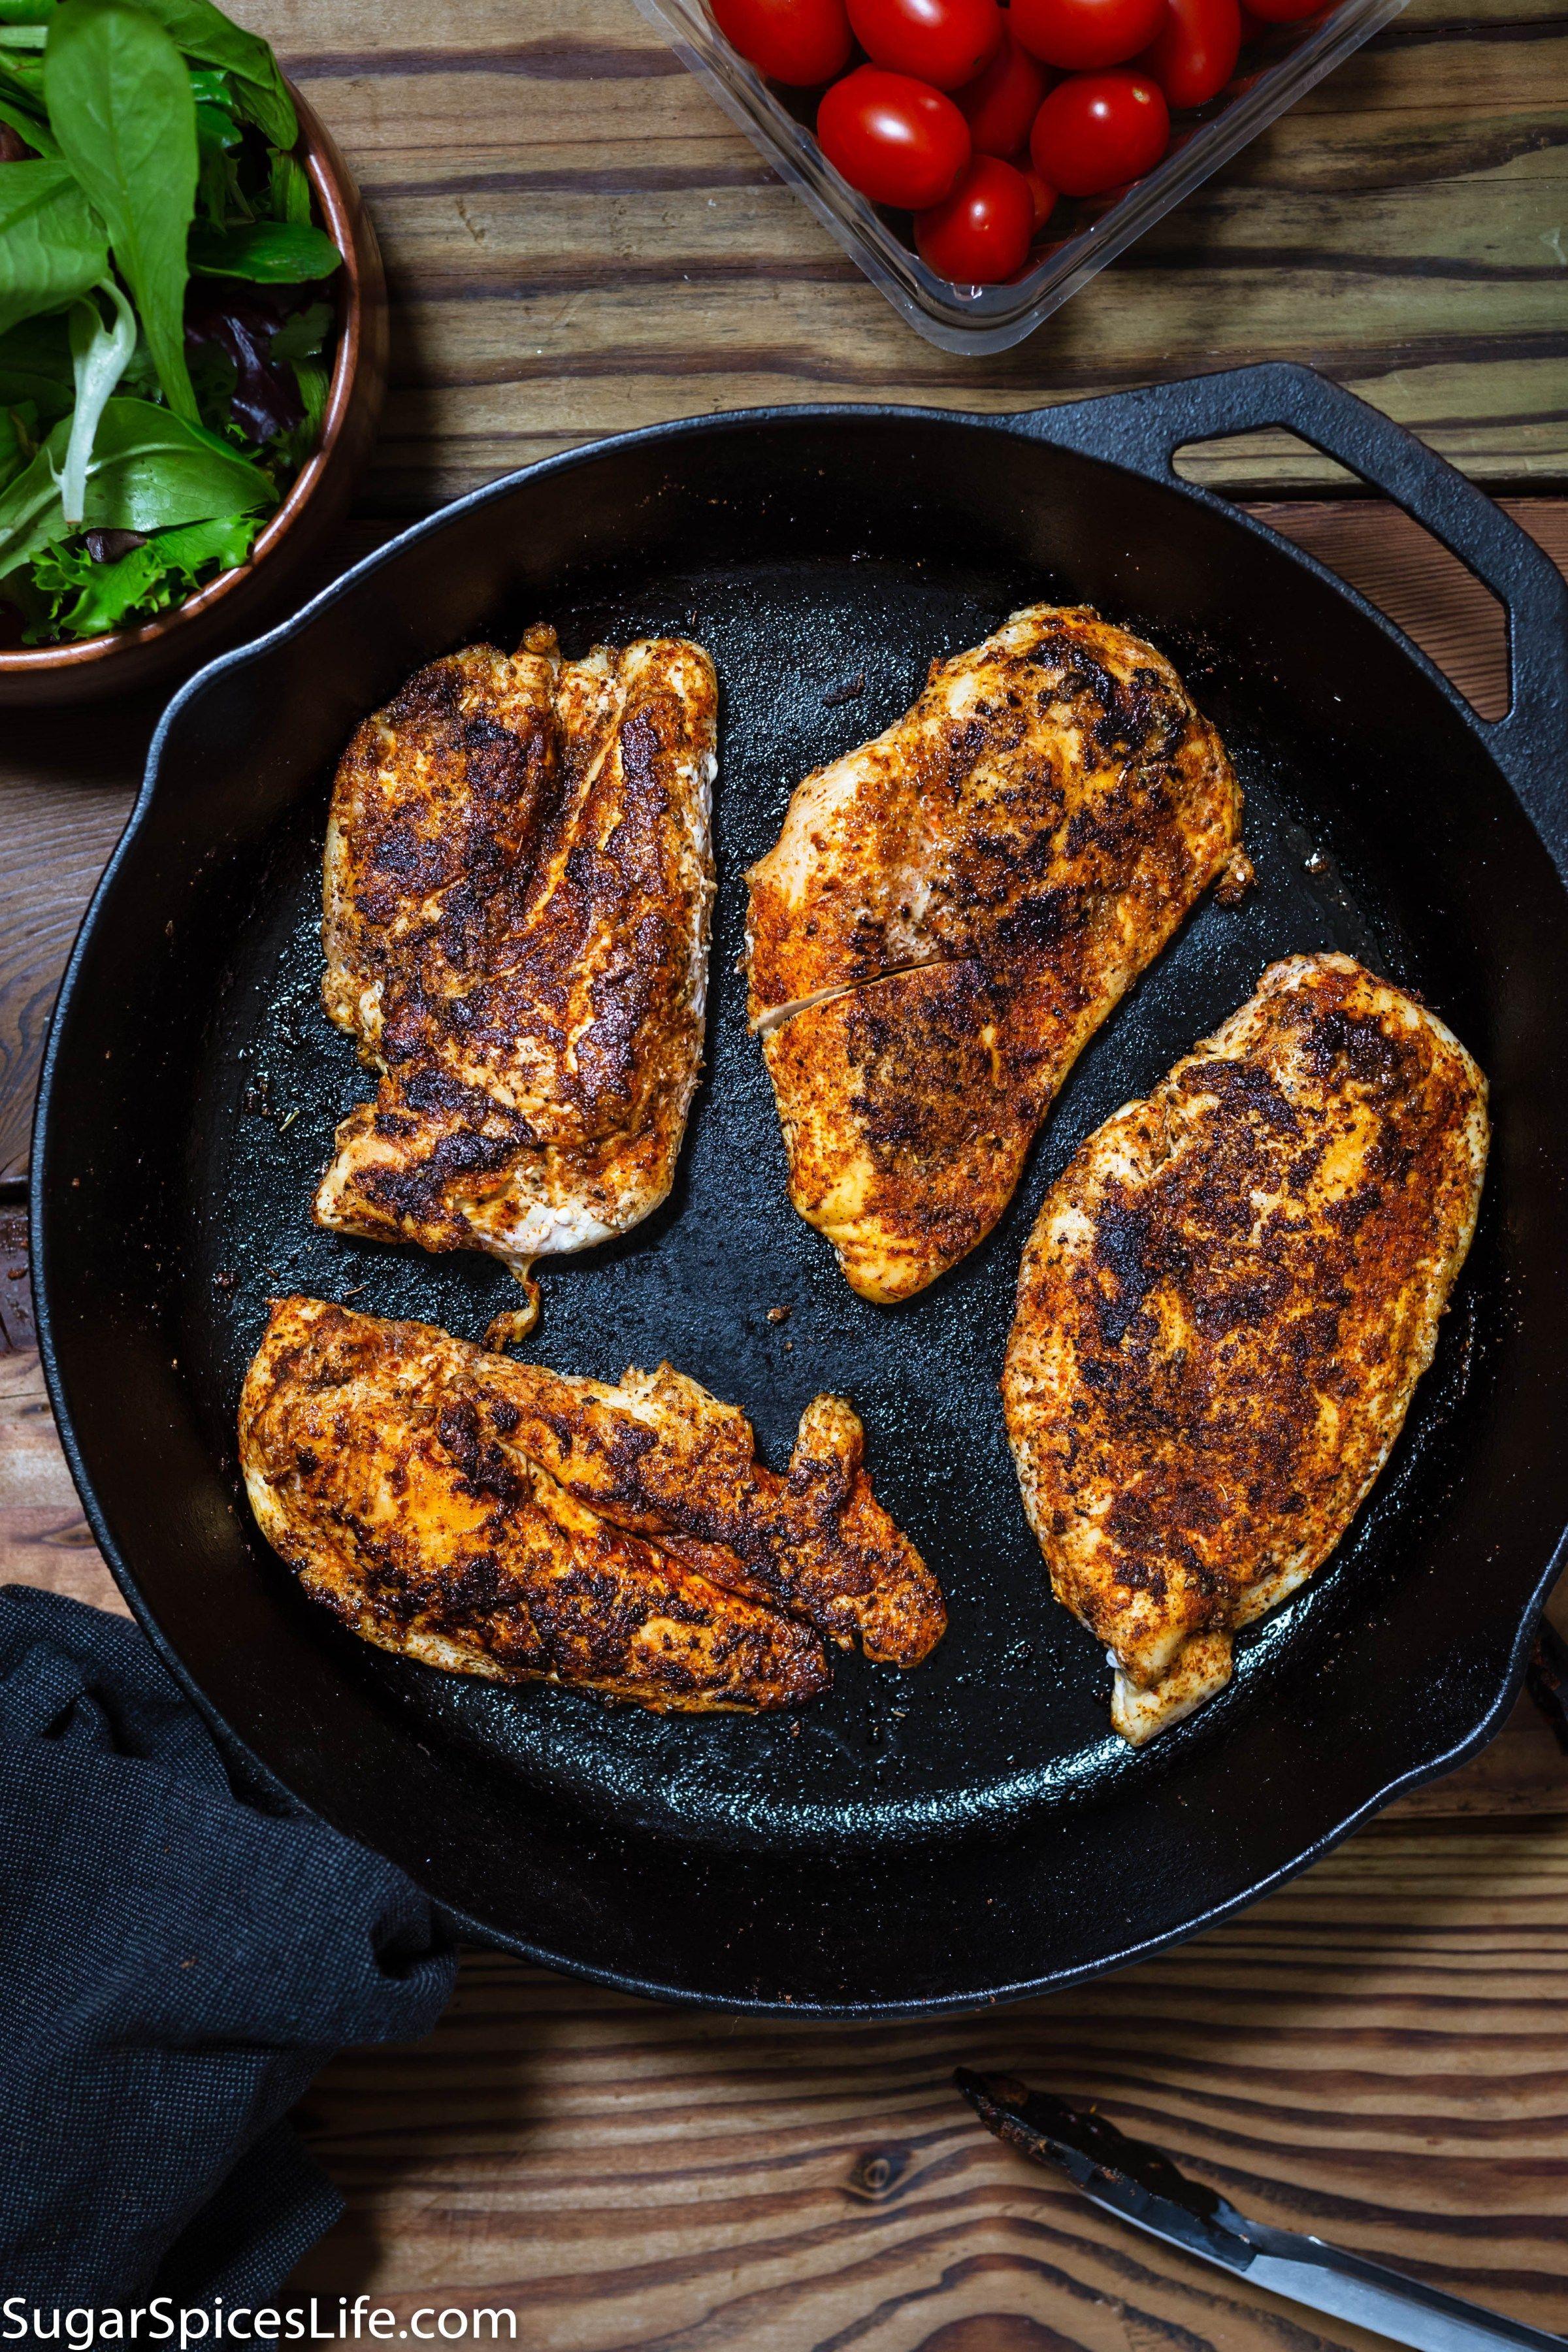 Mild Blackened Skillet Chicken #blackenedchicken